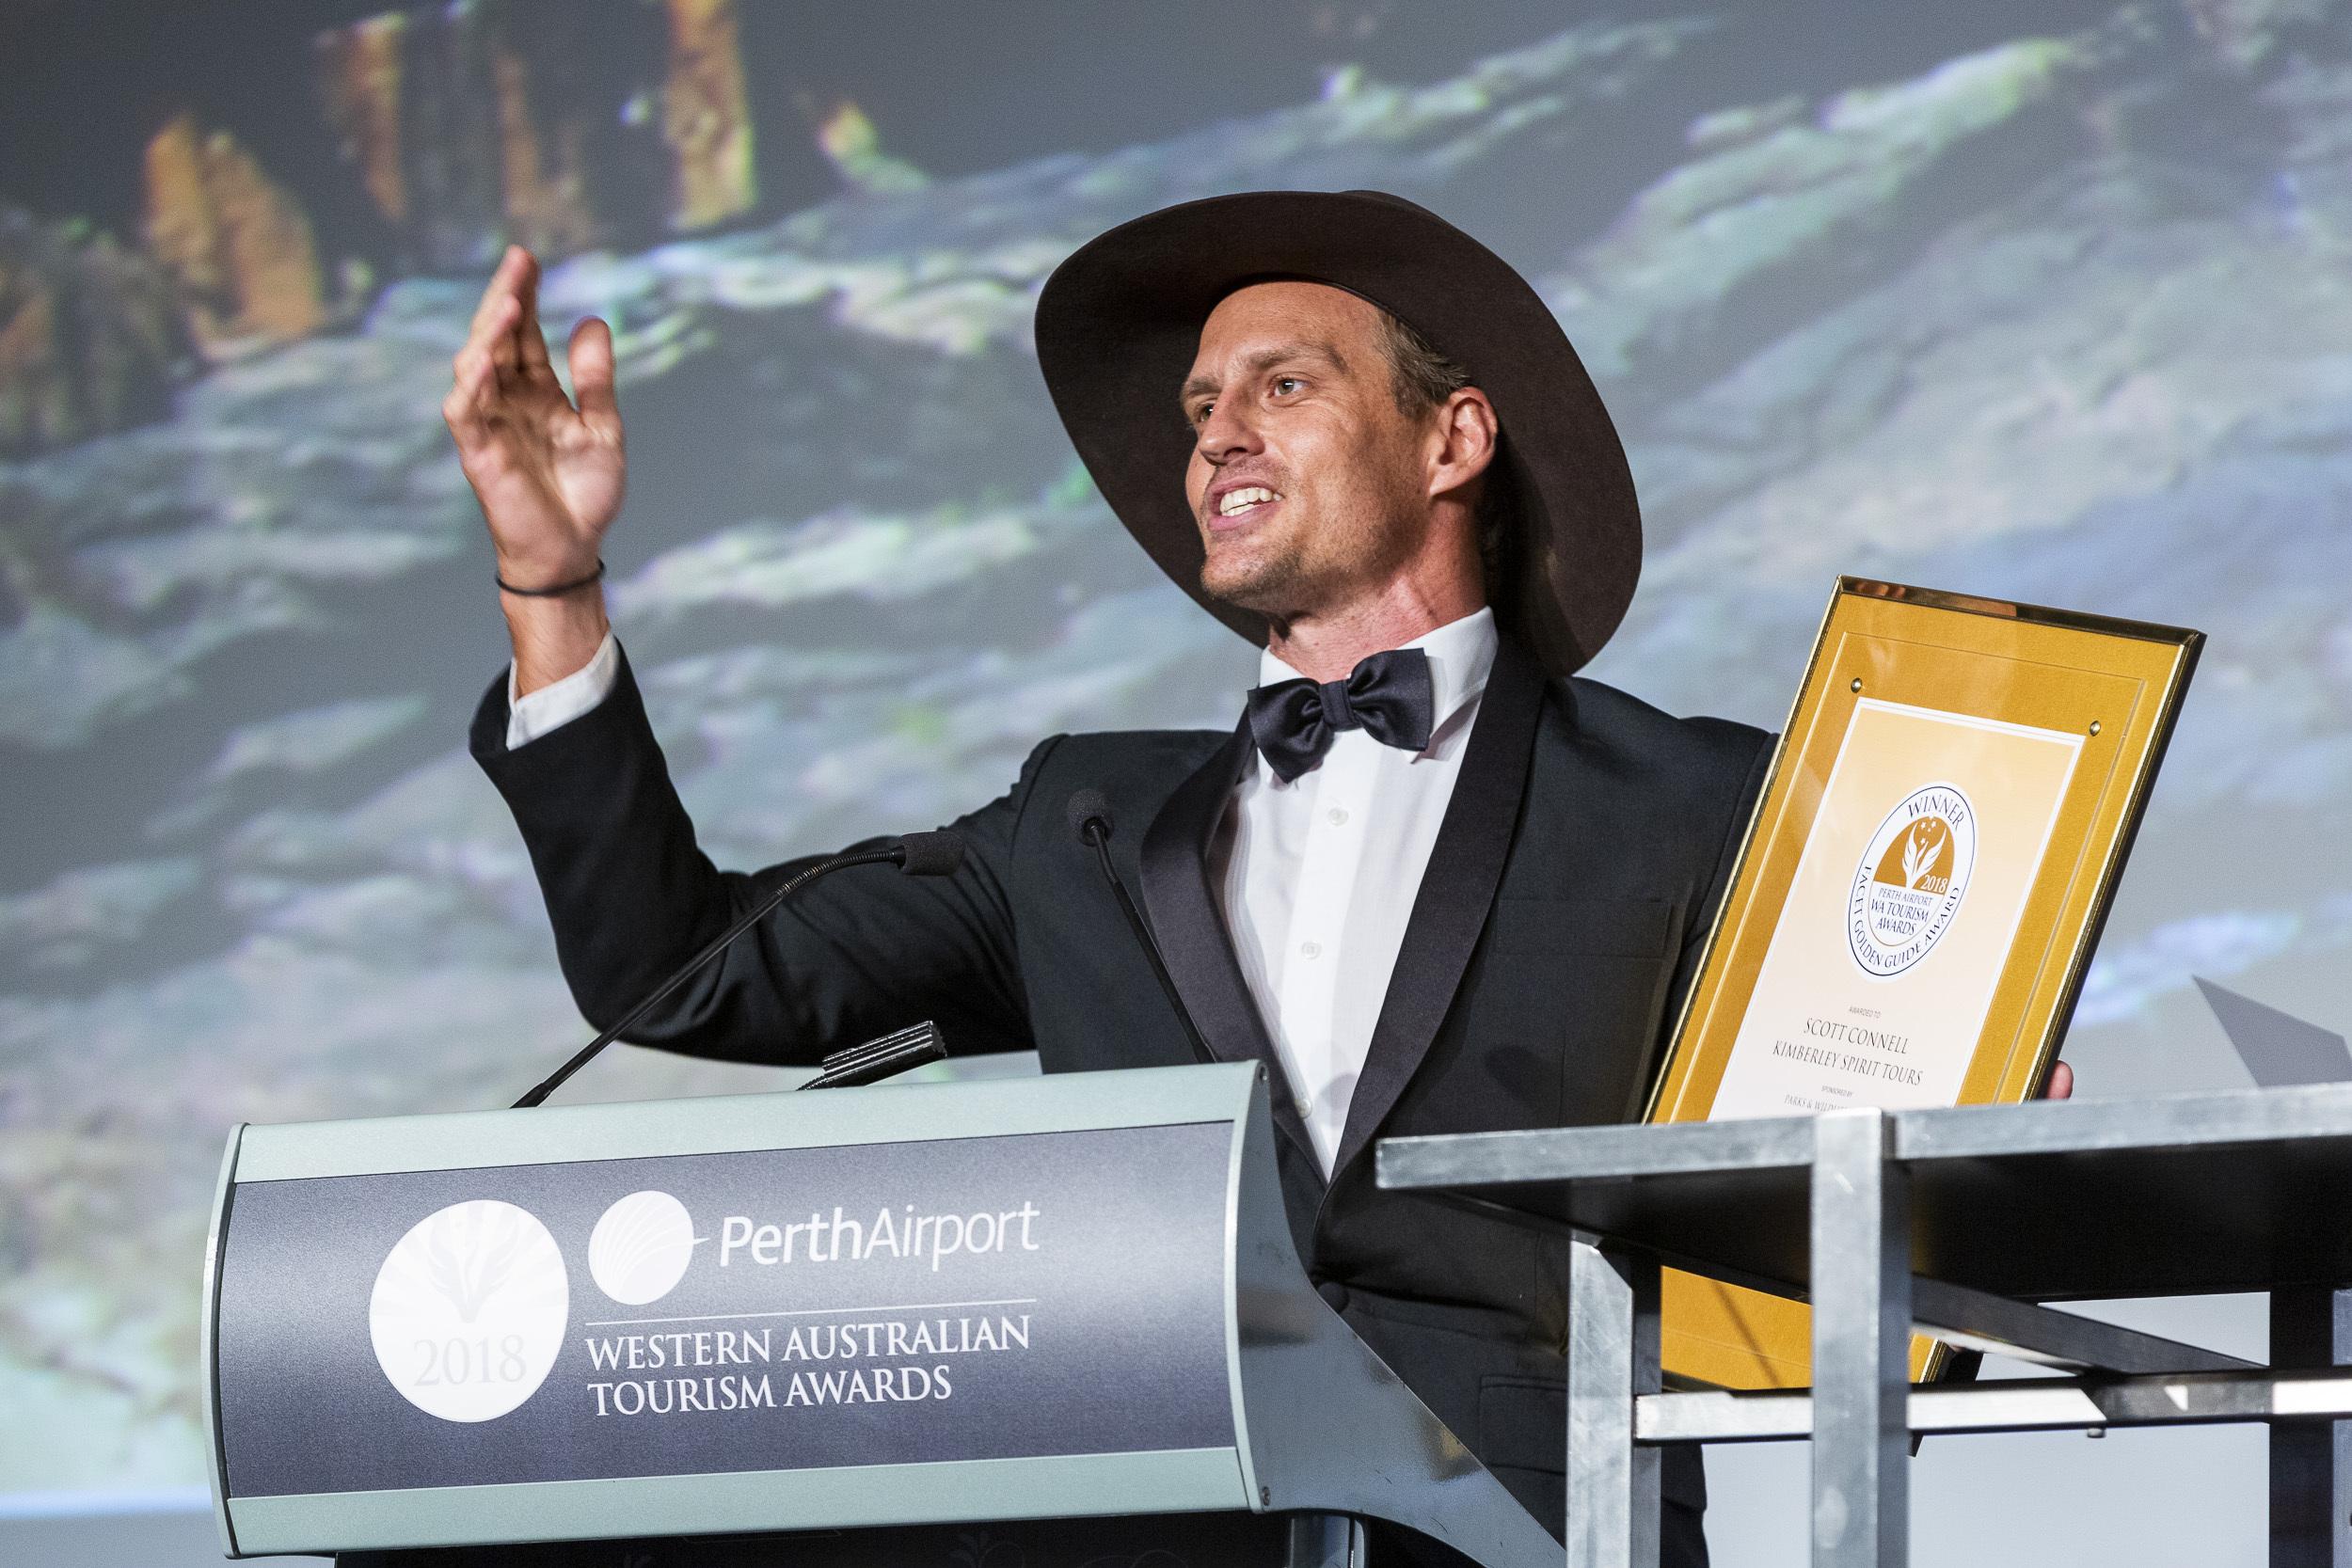 Winning the FACET Golden Guide award in 2018 was a career highlight